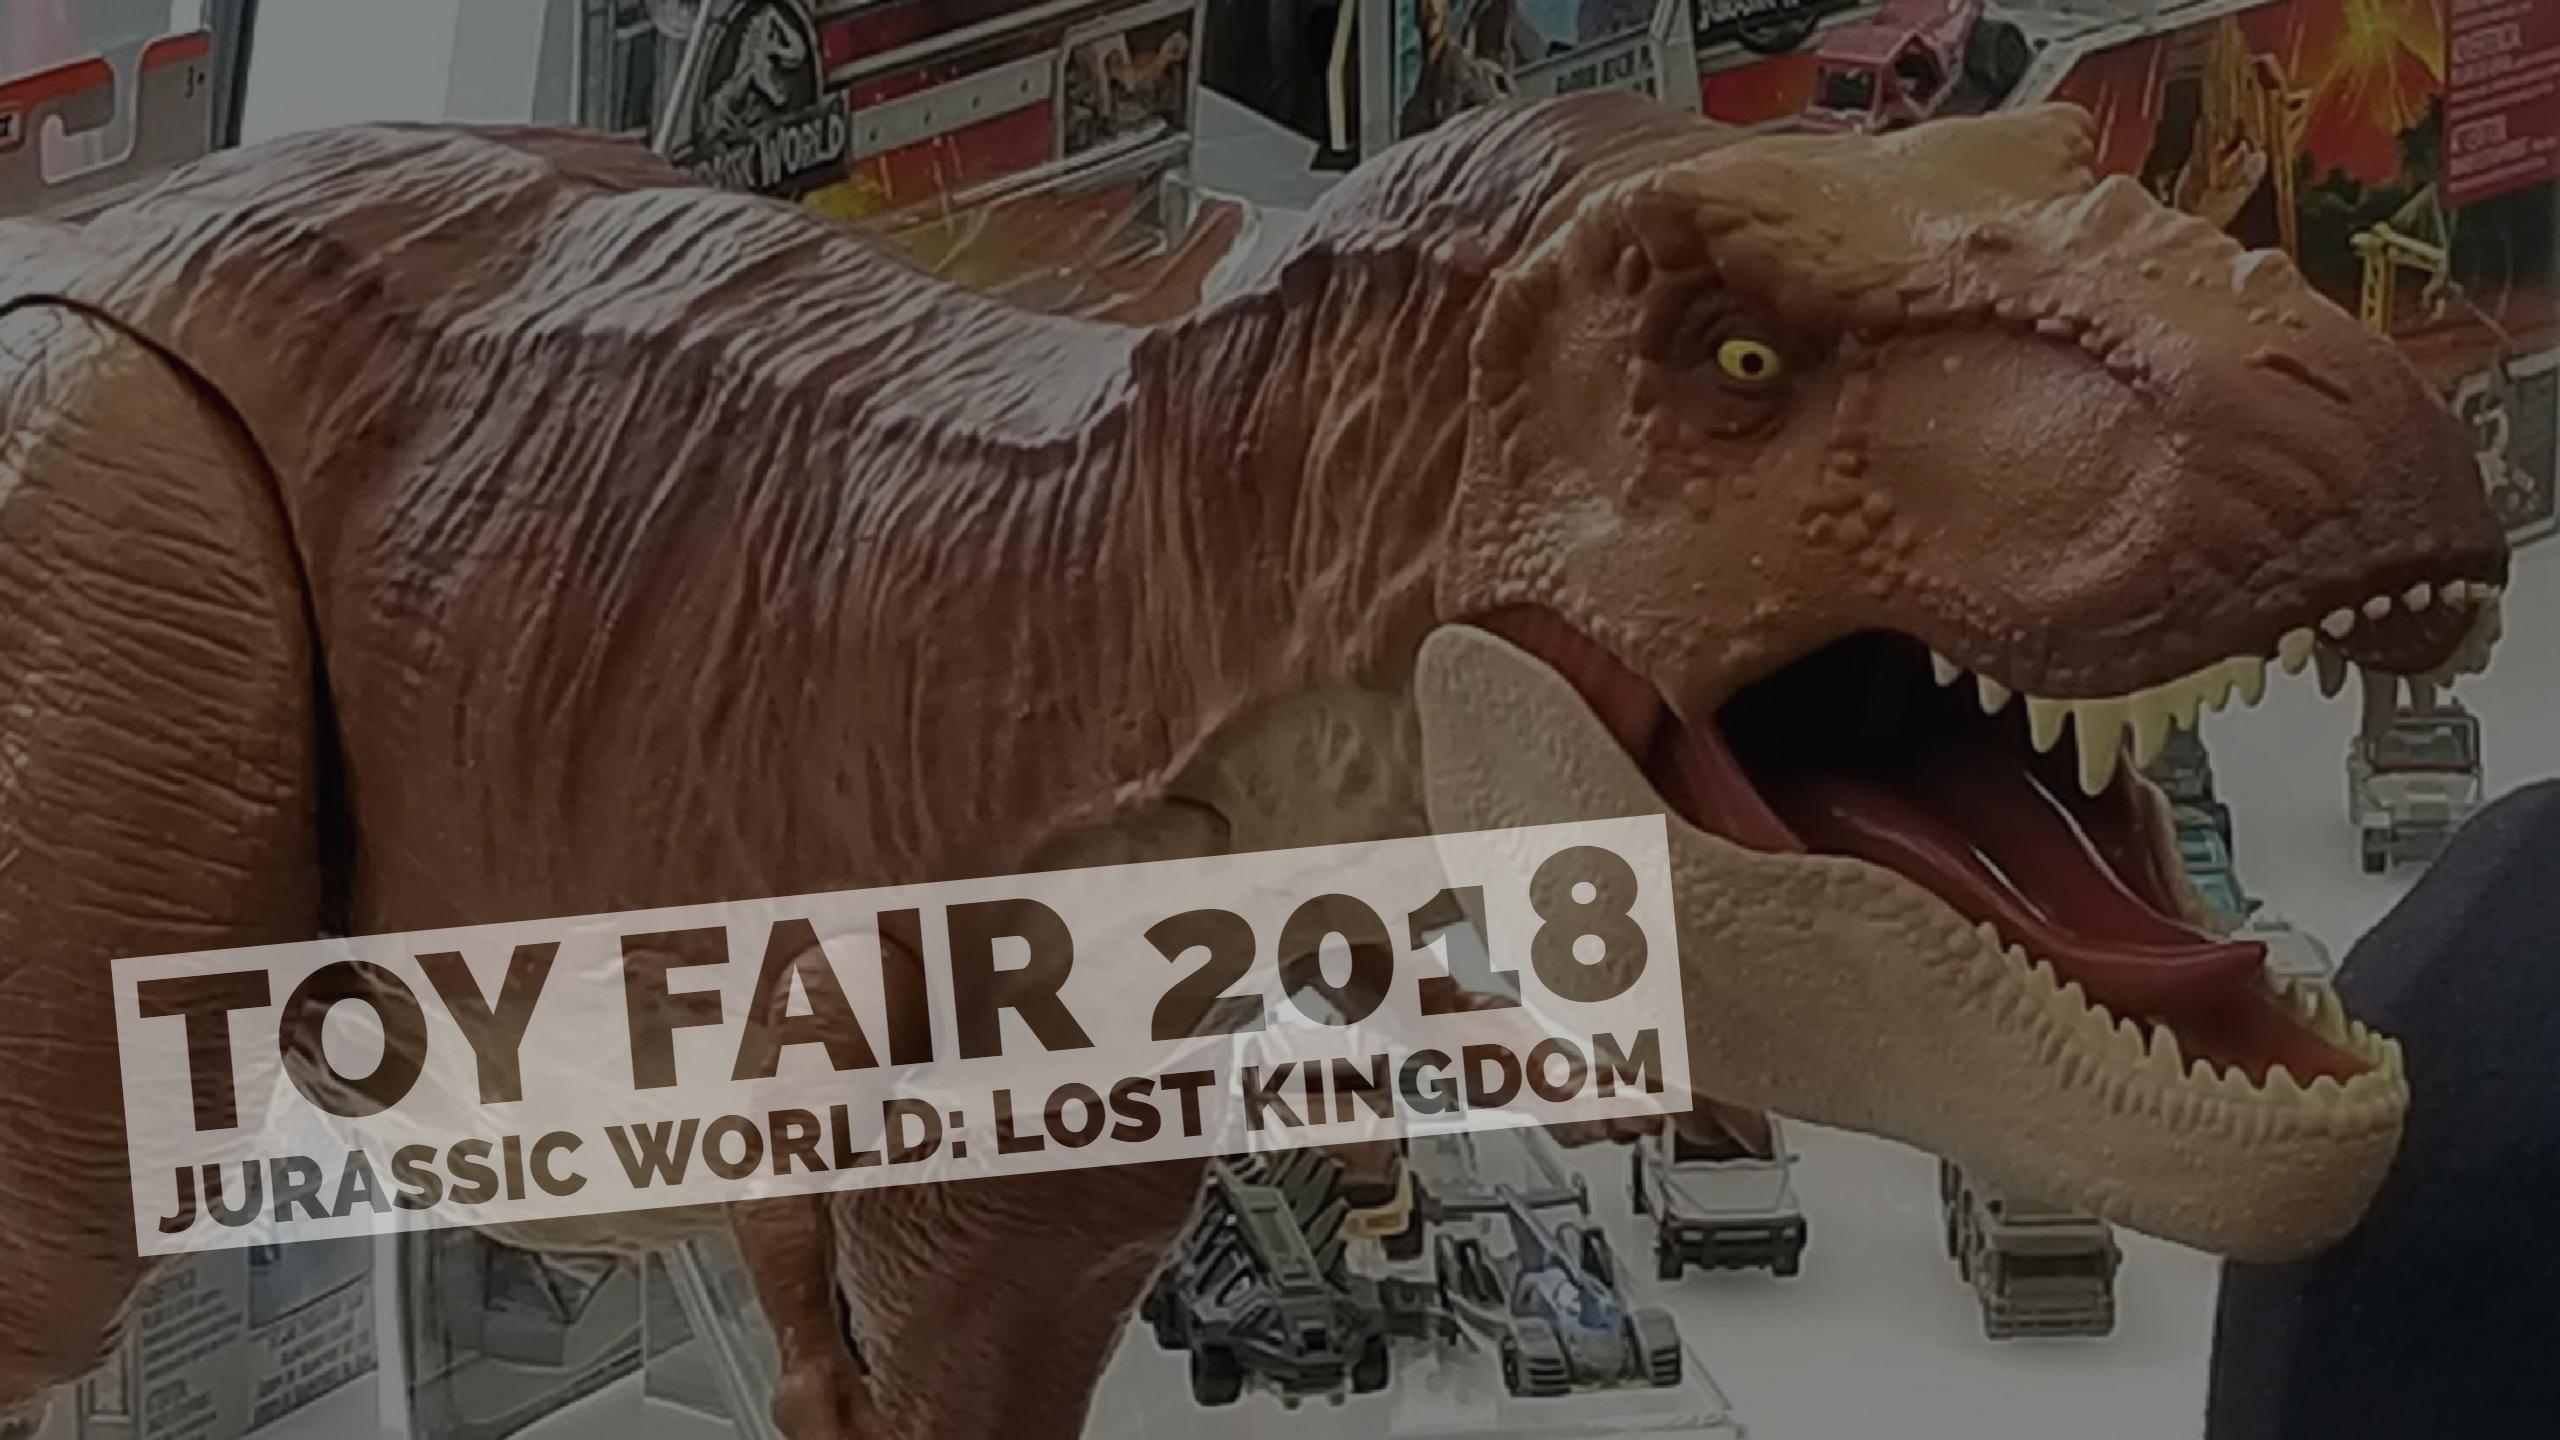 Toy Fair 2018: Jurassic World: Fallen Kingdom is a ...